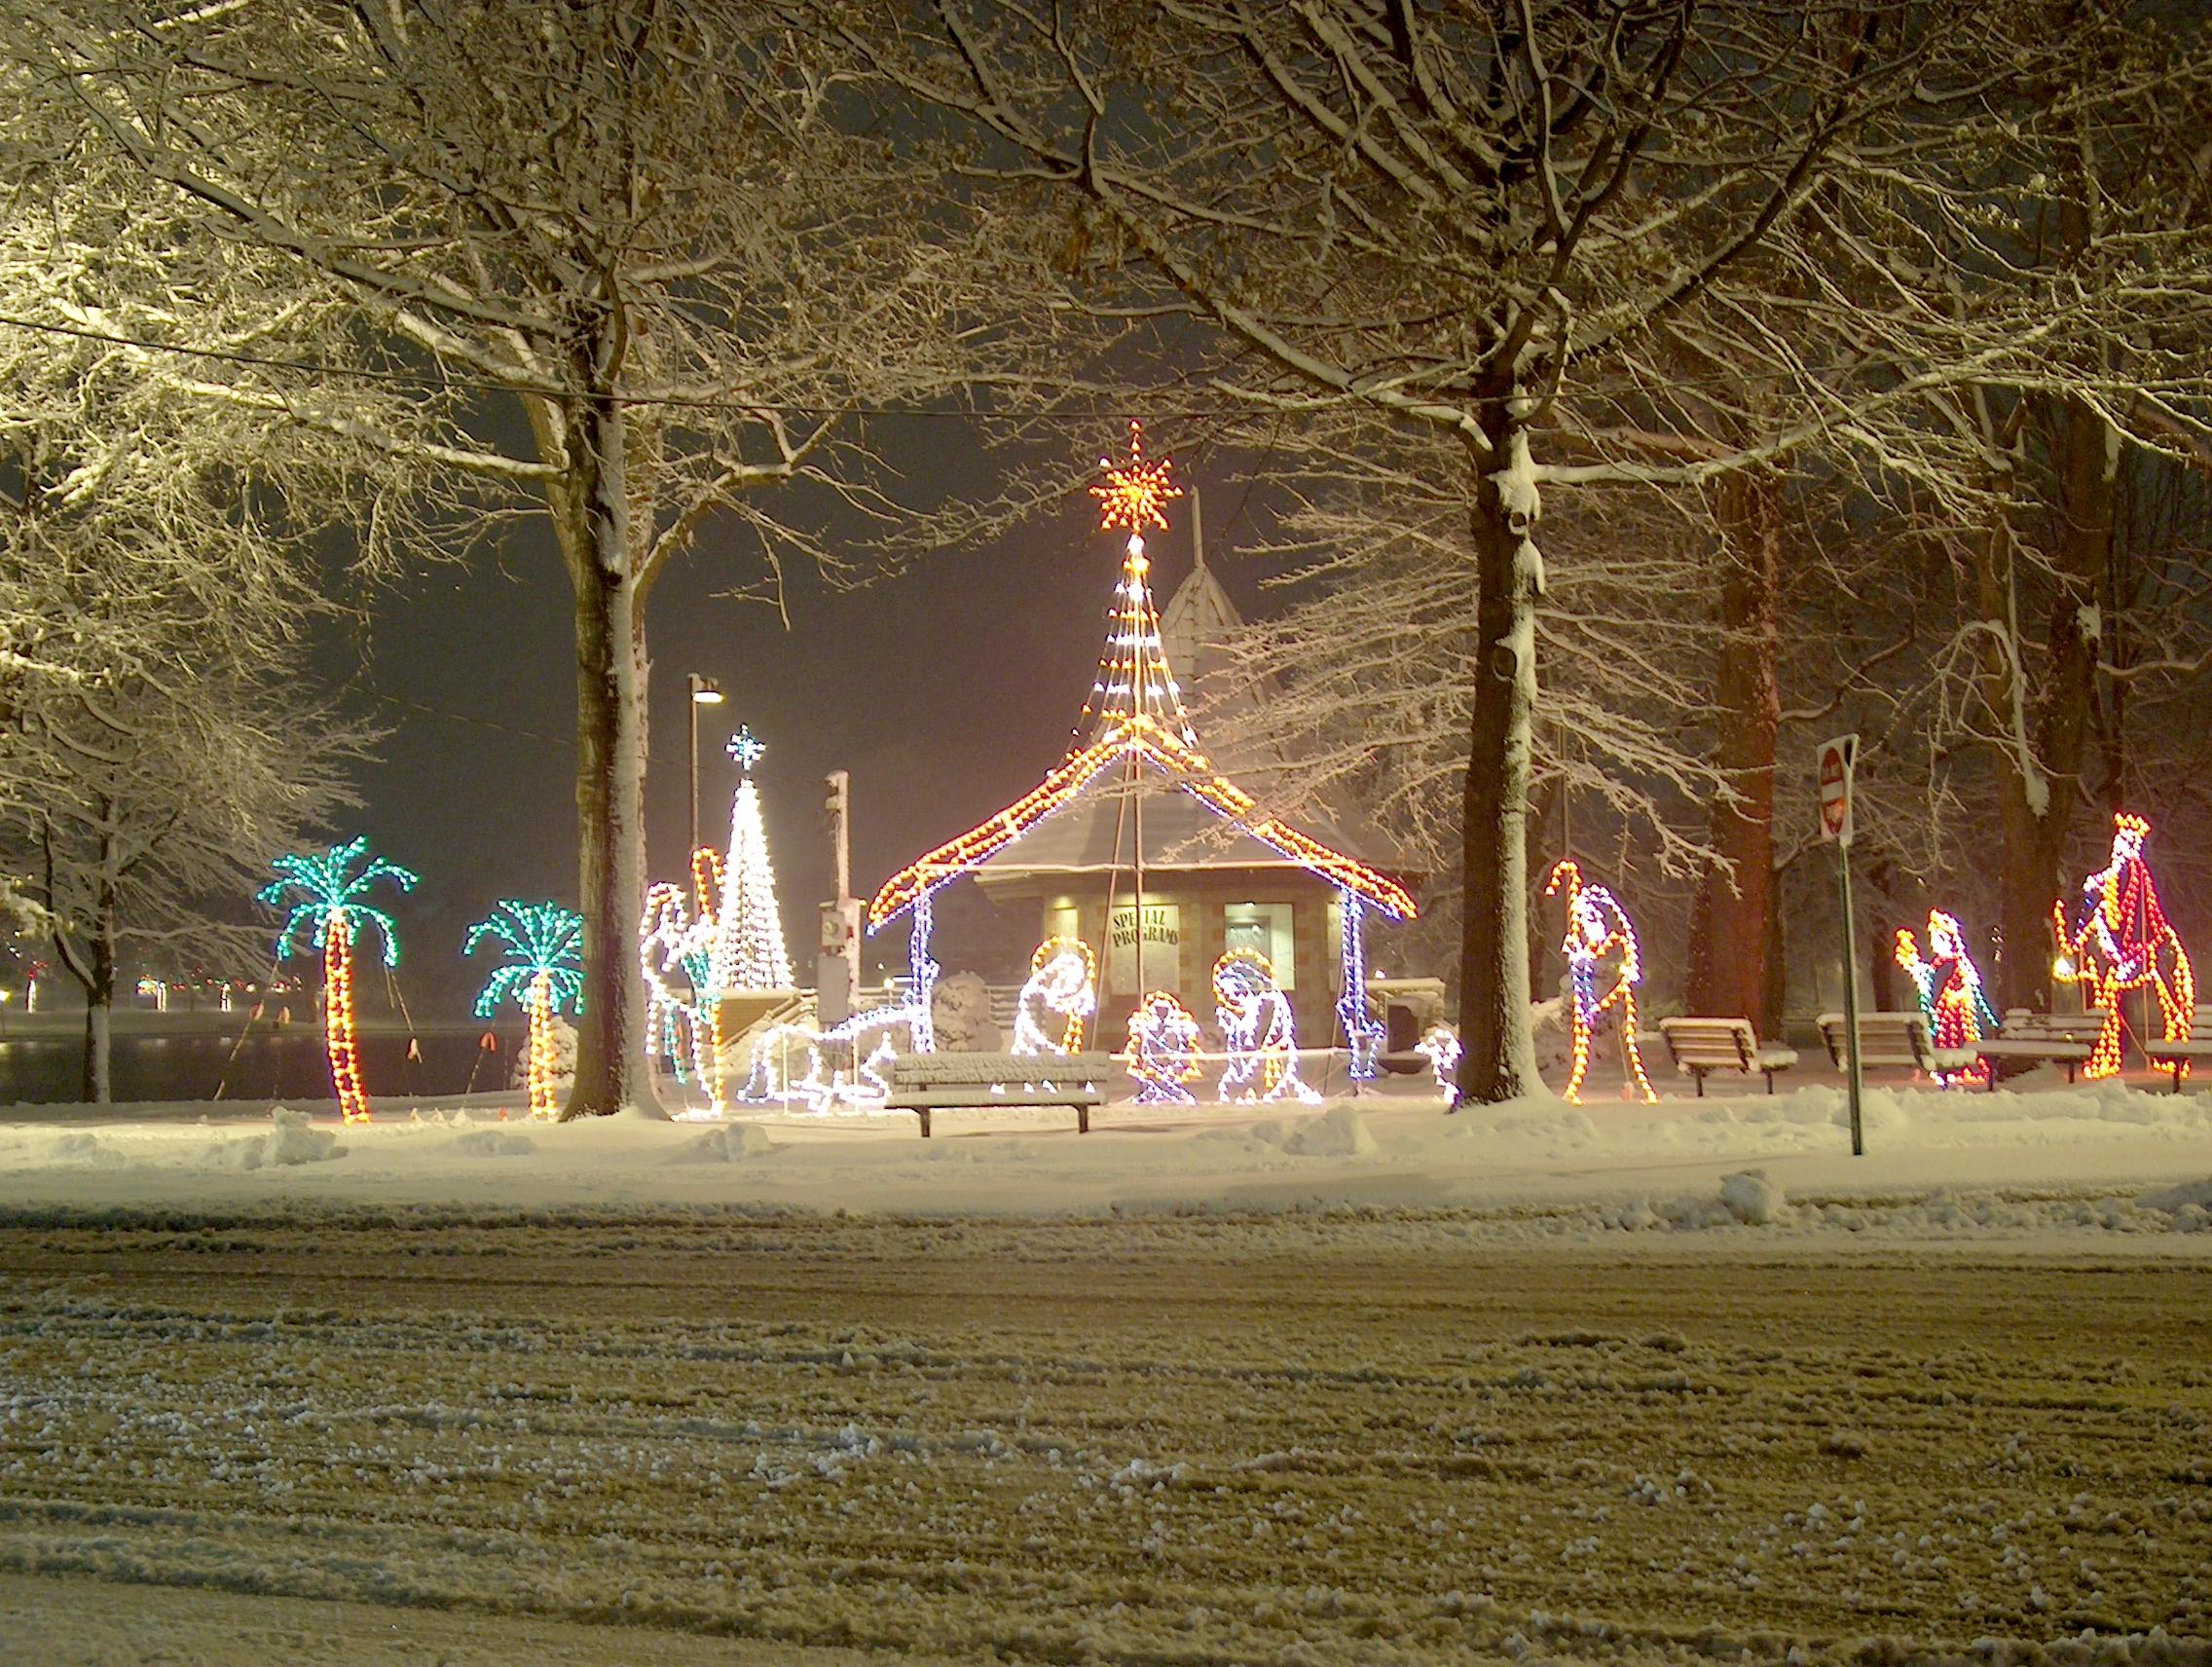 lights nativity scene